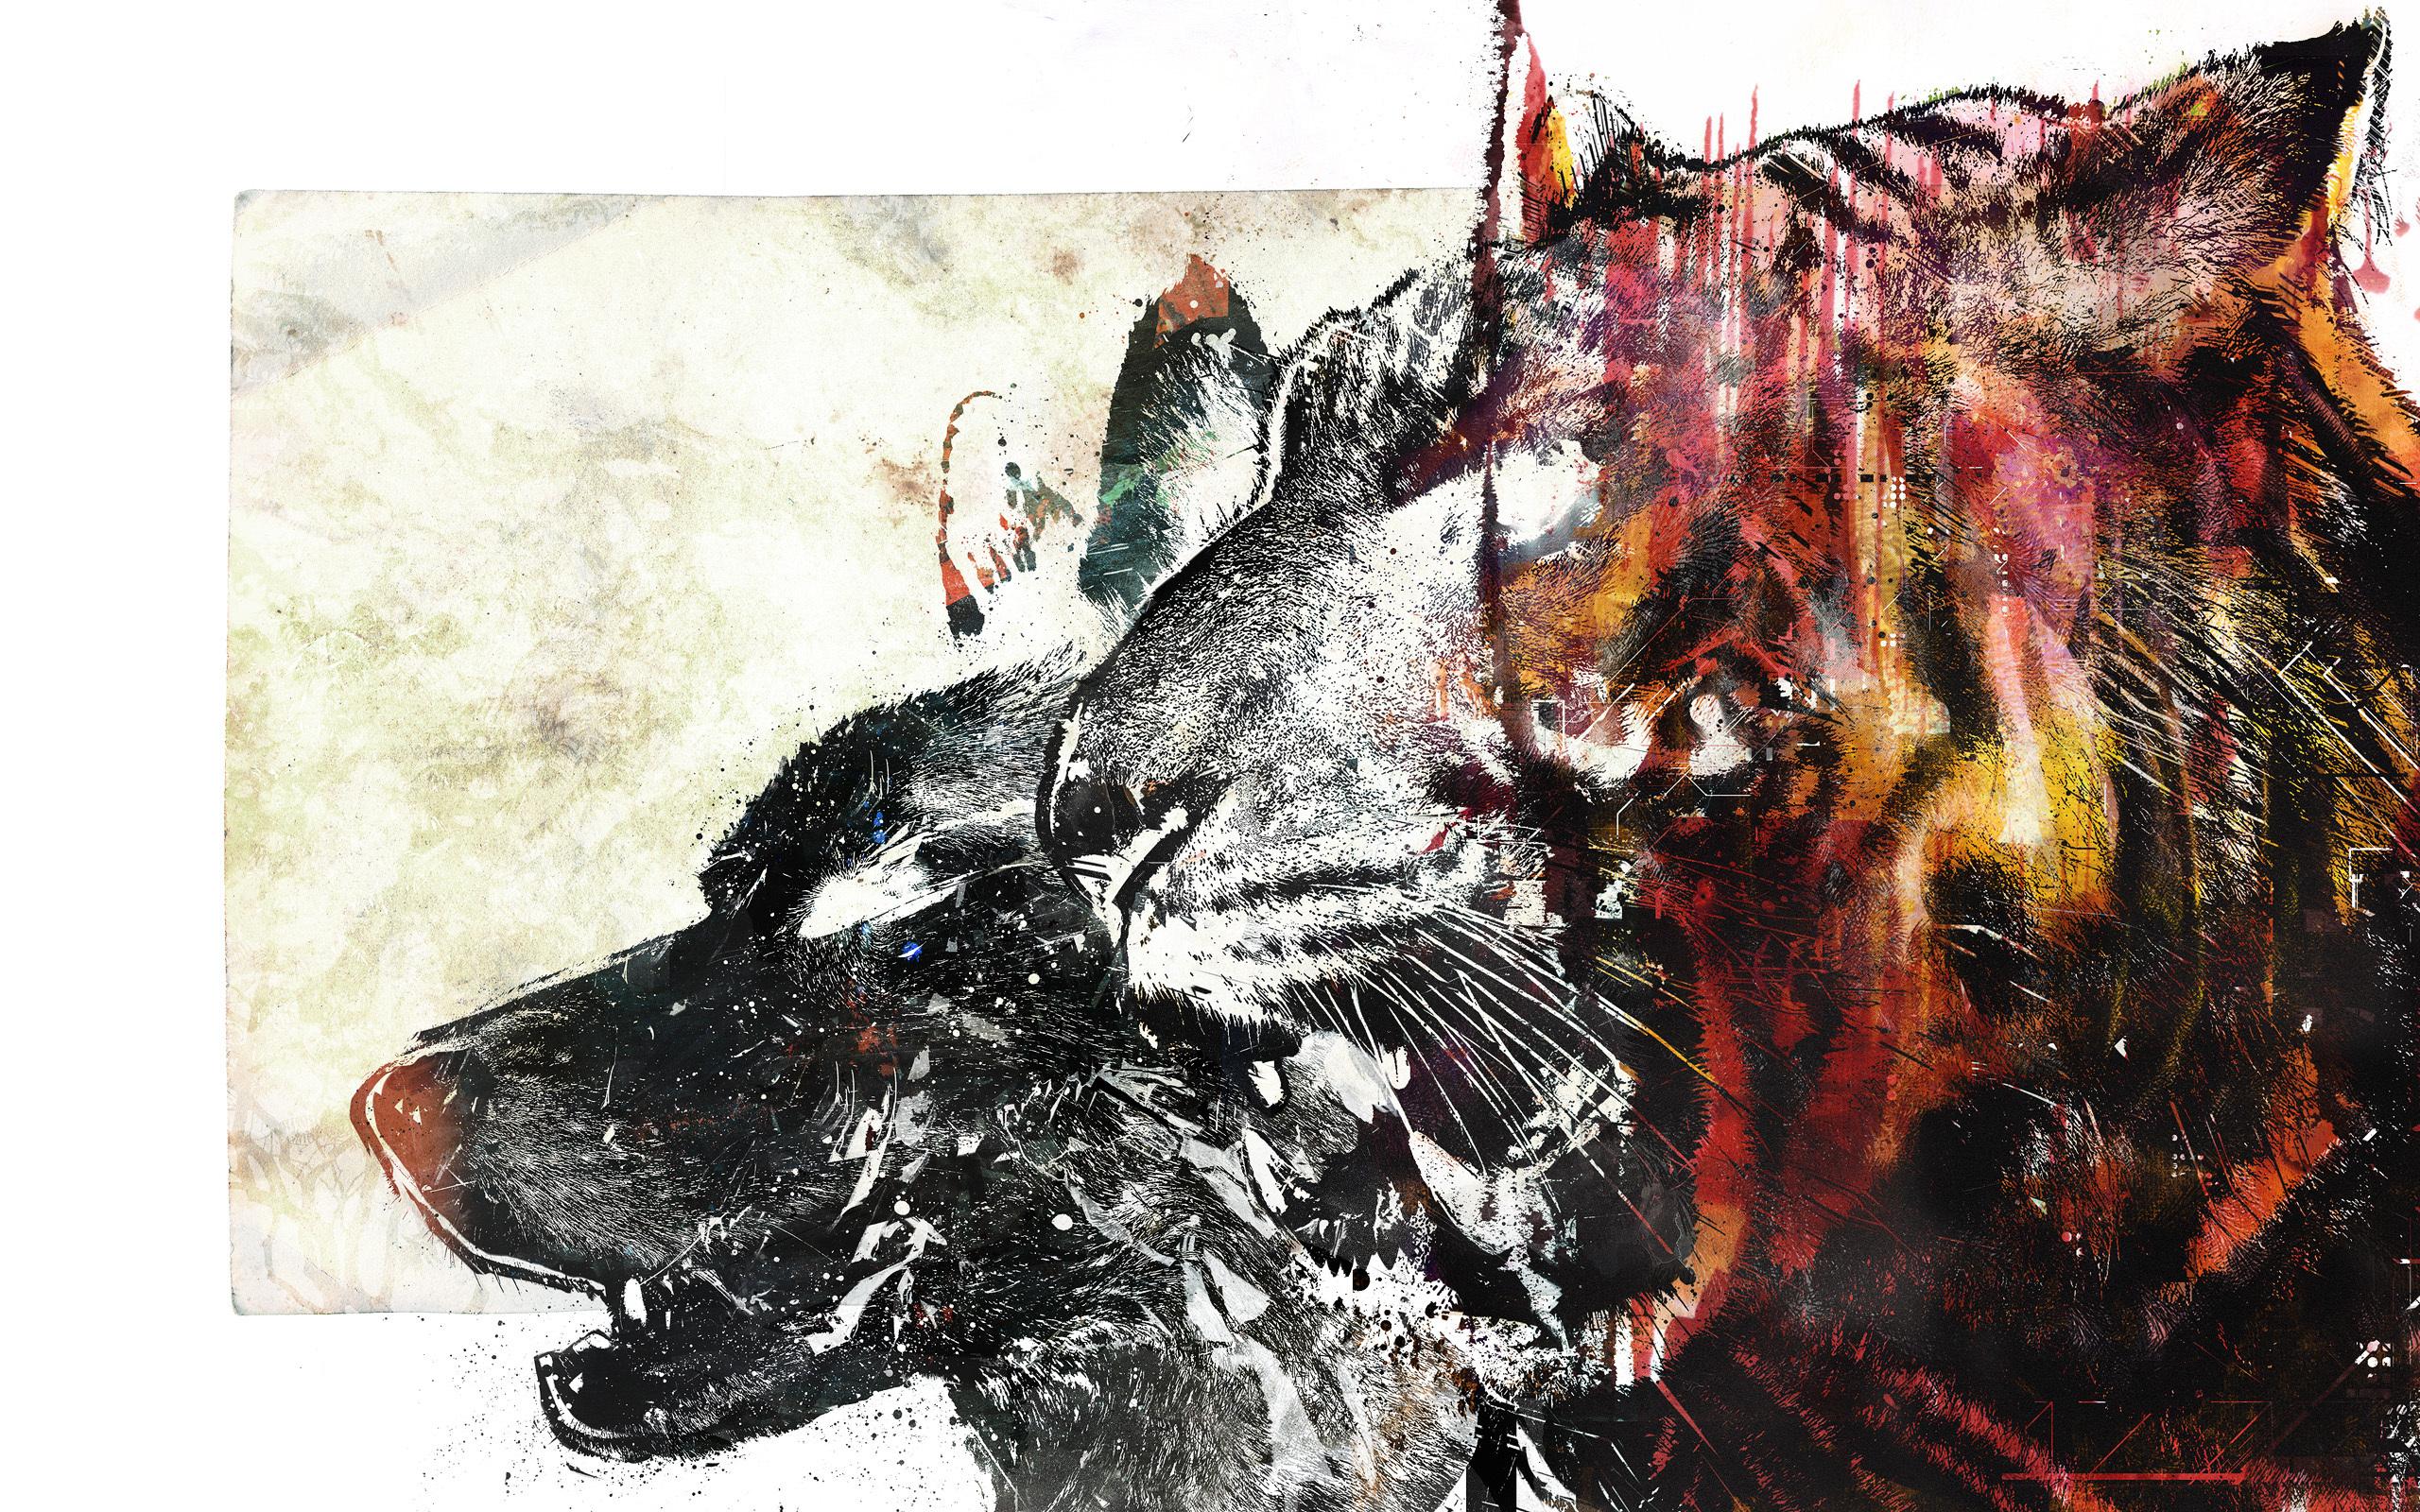 Artistic Computer Wallpapers, Desktop Backgrounds   2560x1600   ID:344280